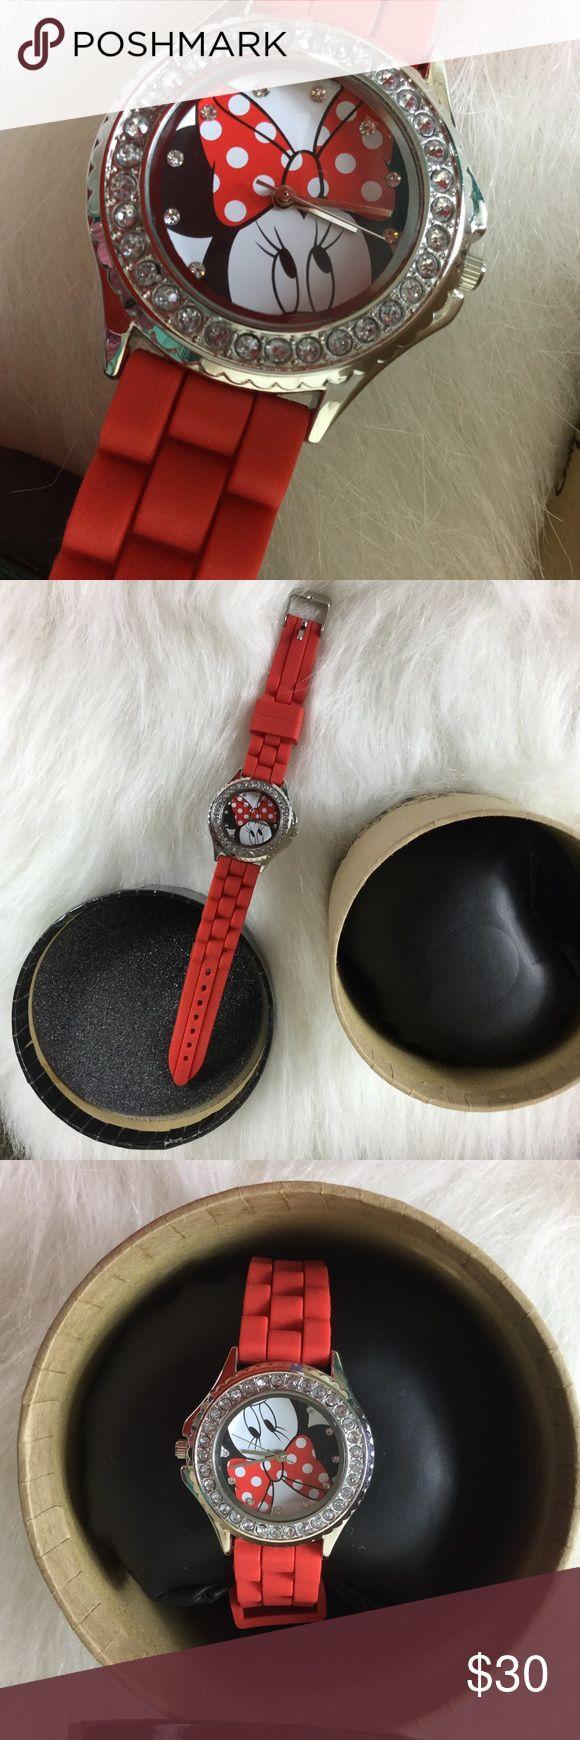 Brand New Disney Warch Brand New Minnie Mouse Disney Watch Disney Accessories Watches